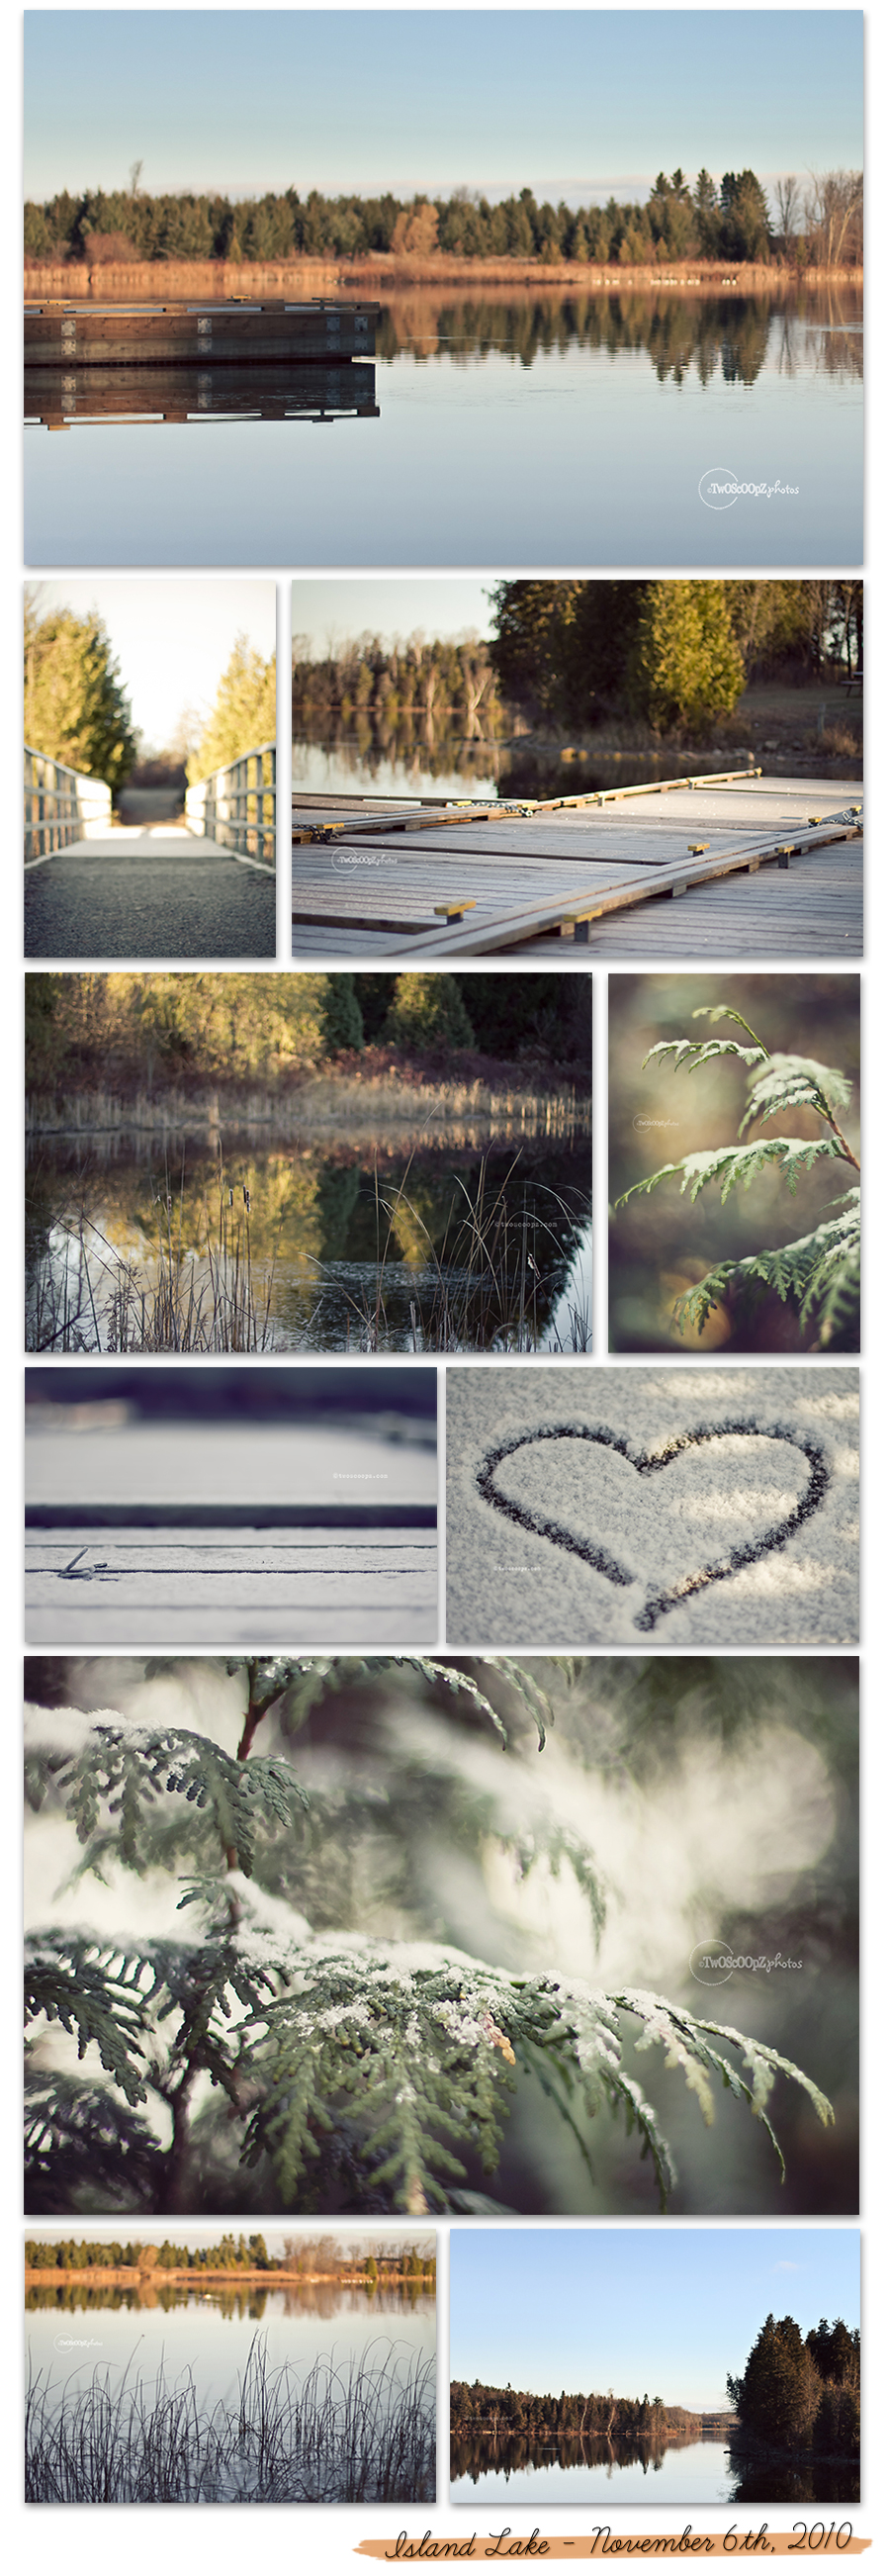 day310 - Island Lake - blog page